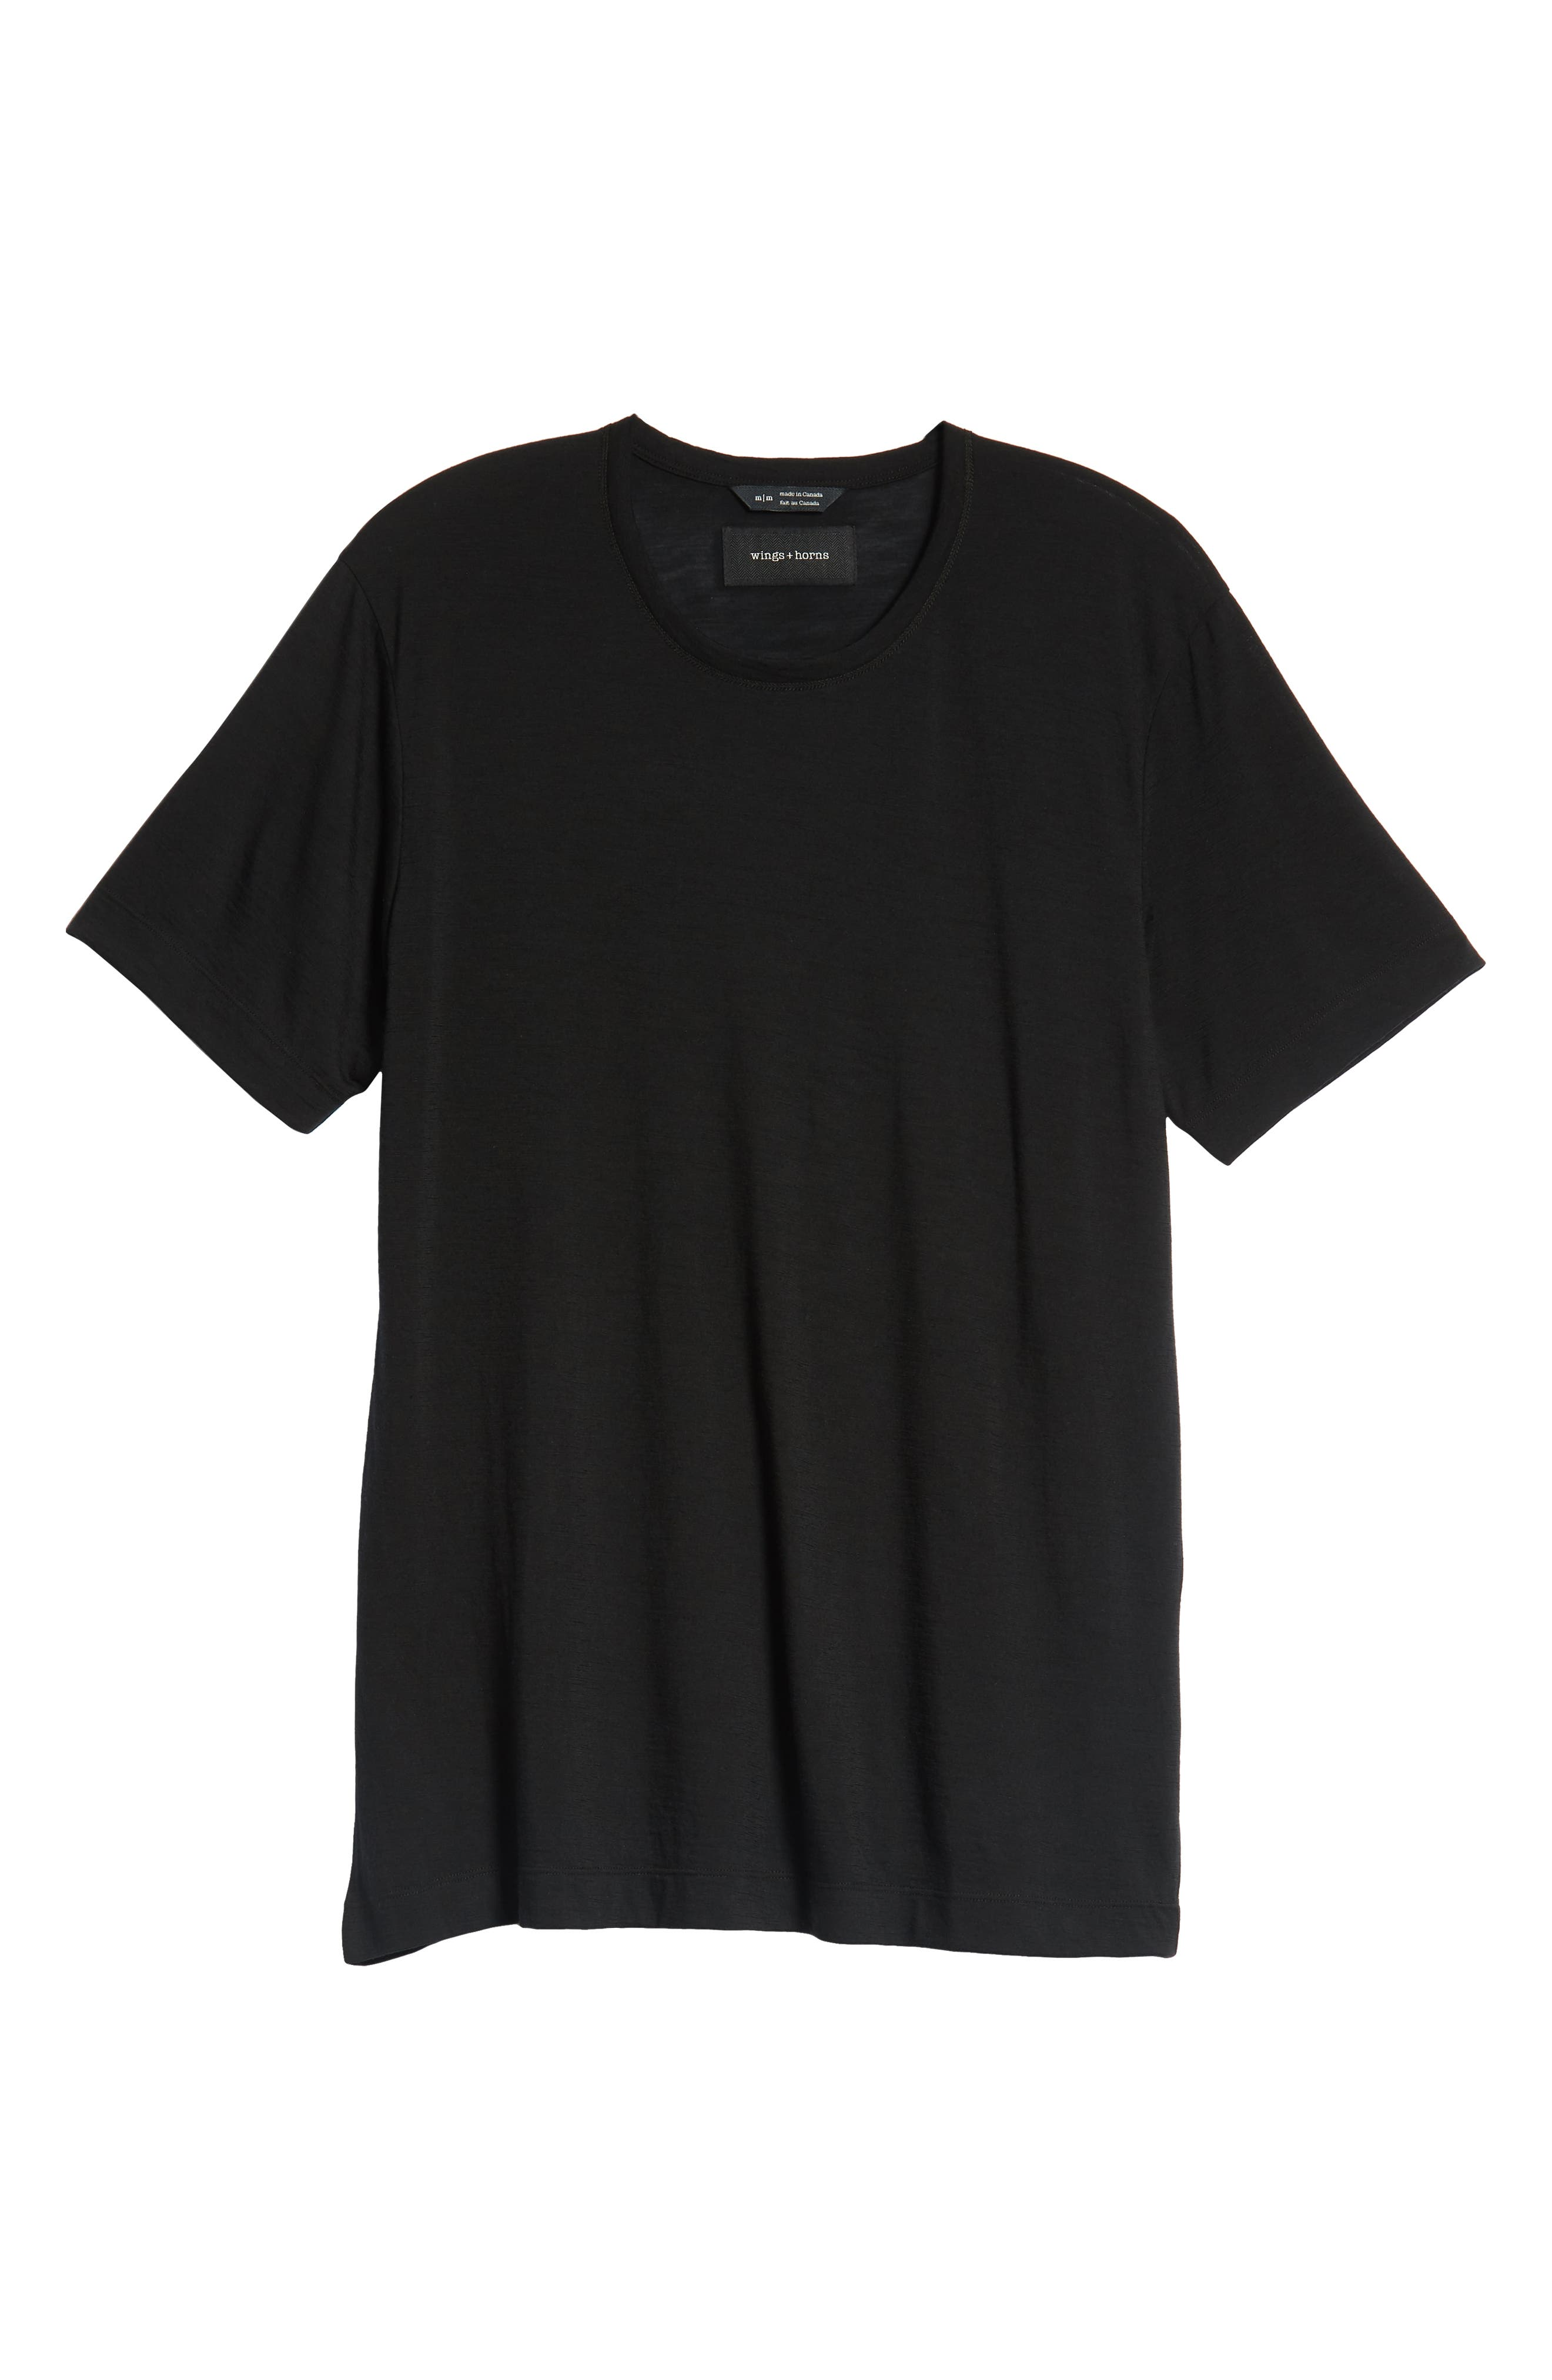 Swedish Merino Wool T-Shirt,                             Alternate thumbnail 6, color,                             BLACK